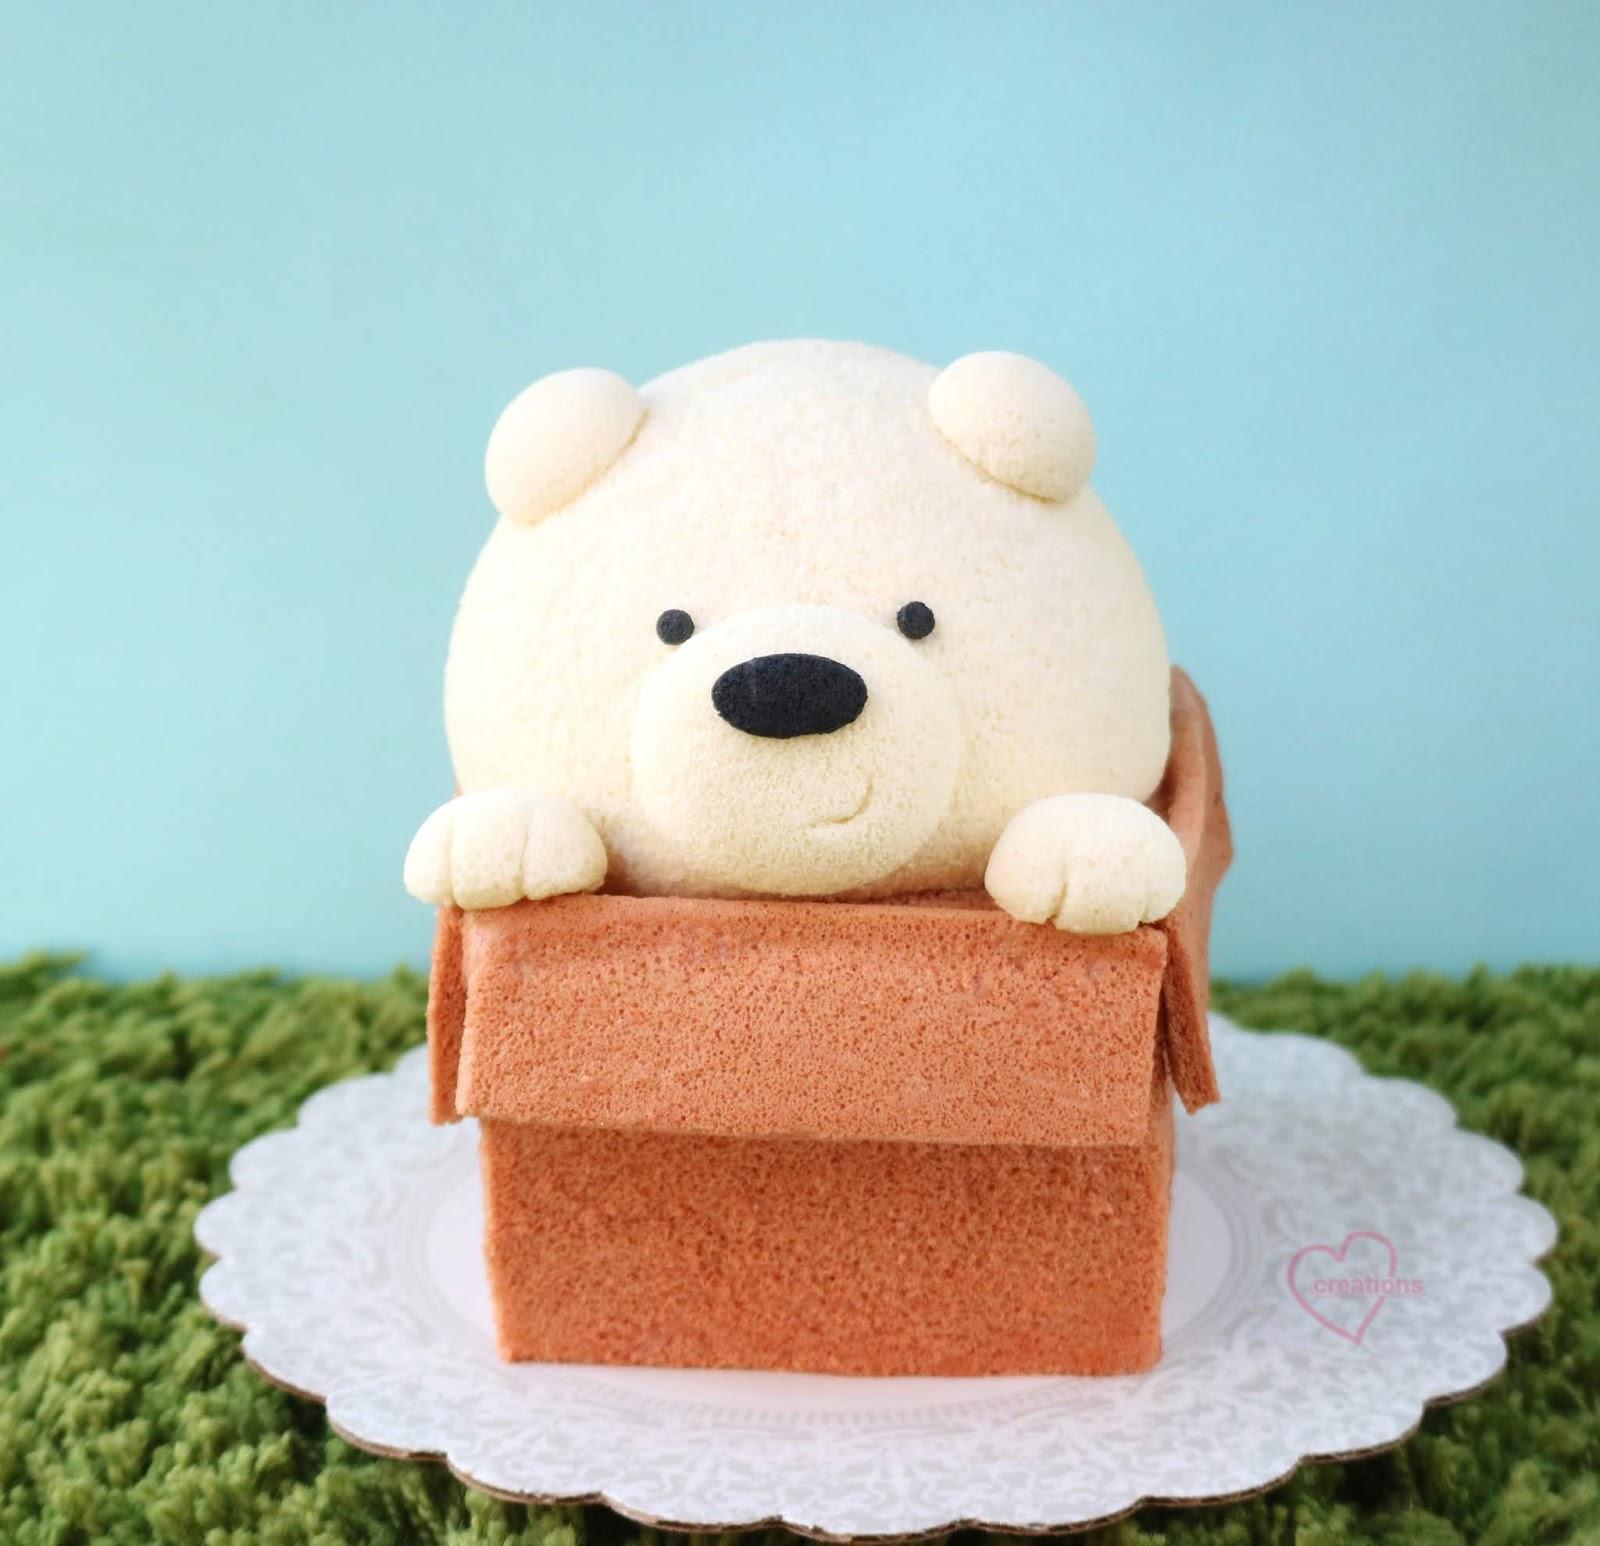 Loving Creations for You: We Bare Bears Ice Bear Chiffon Cake